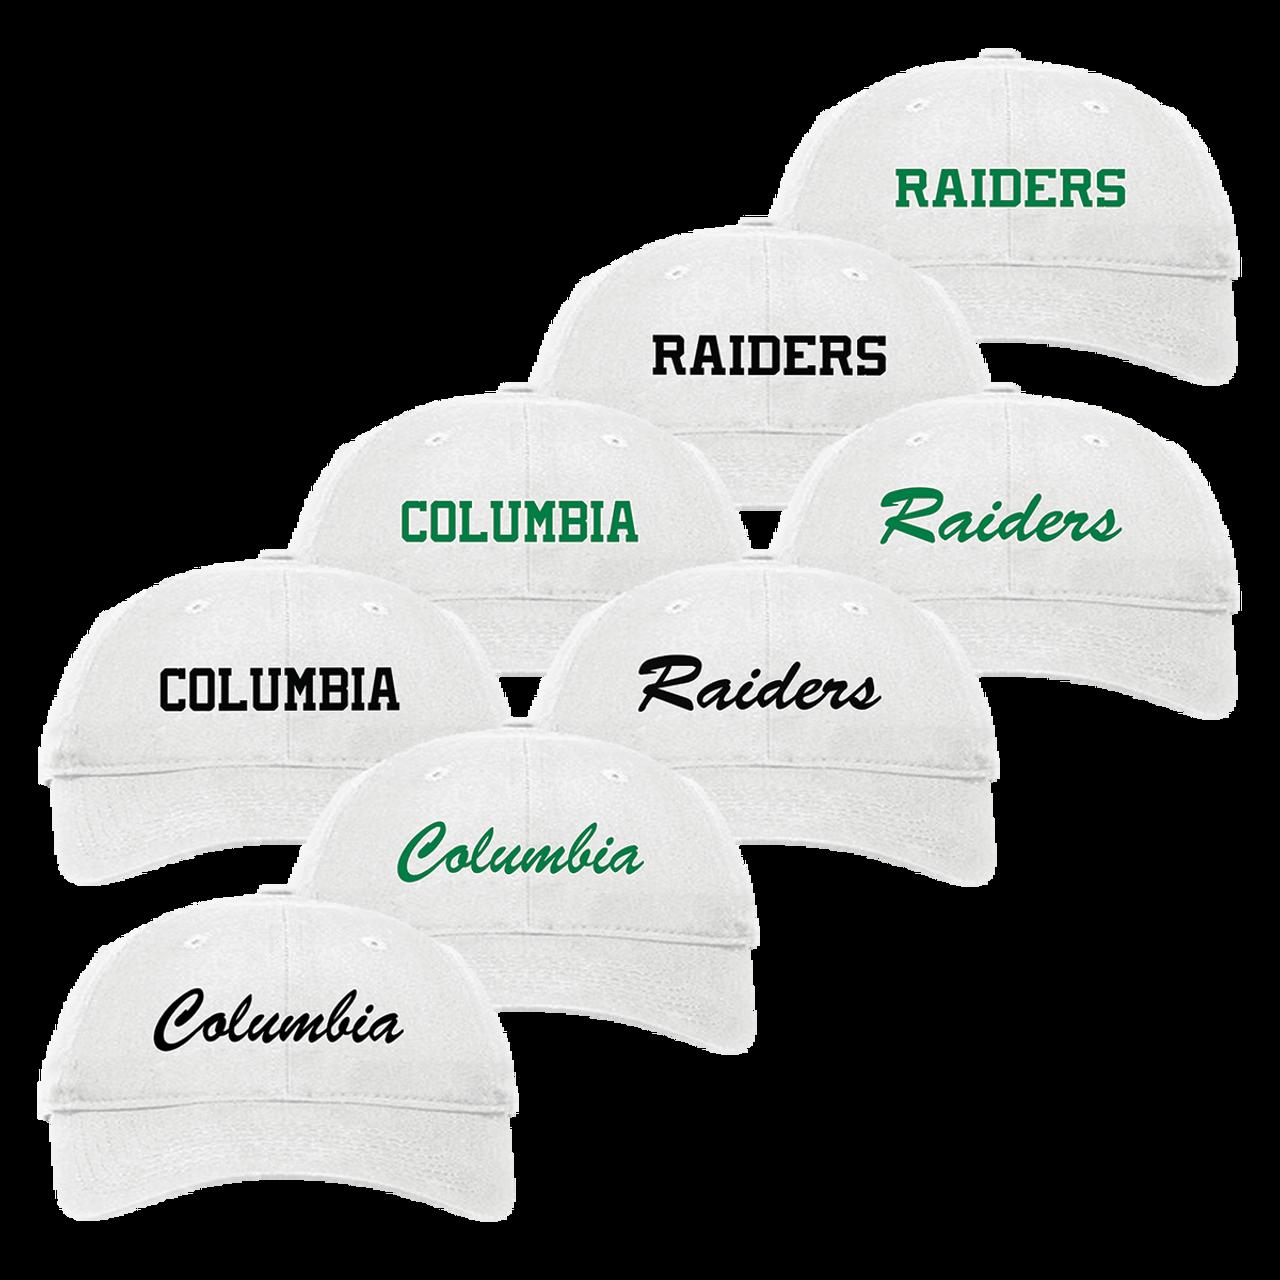 60a15b2a03e6f Columbia Raiders Adjustable Cap (RY200-RY207) - RycoSports